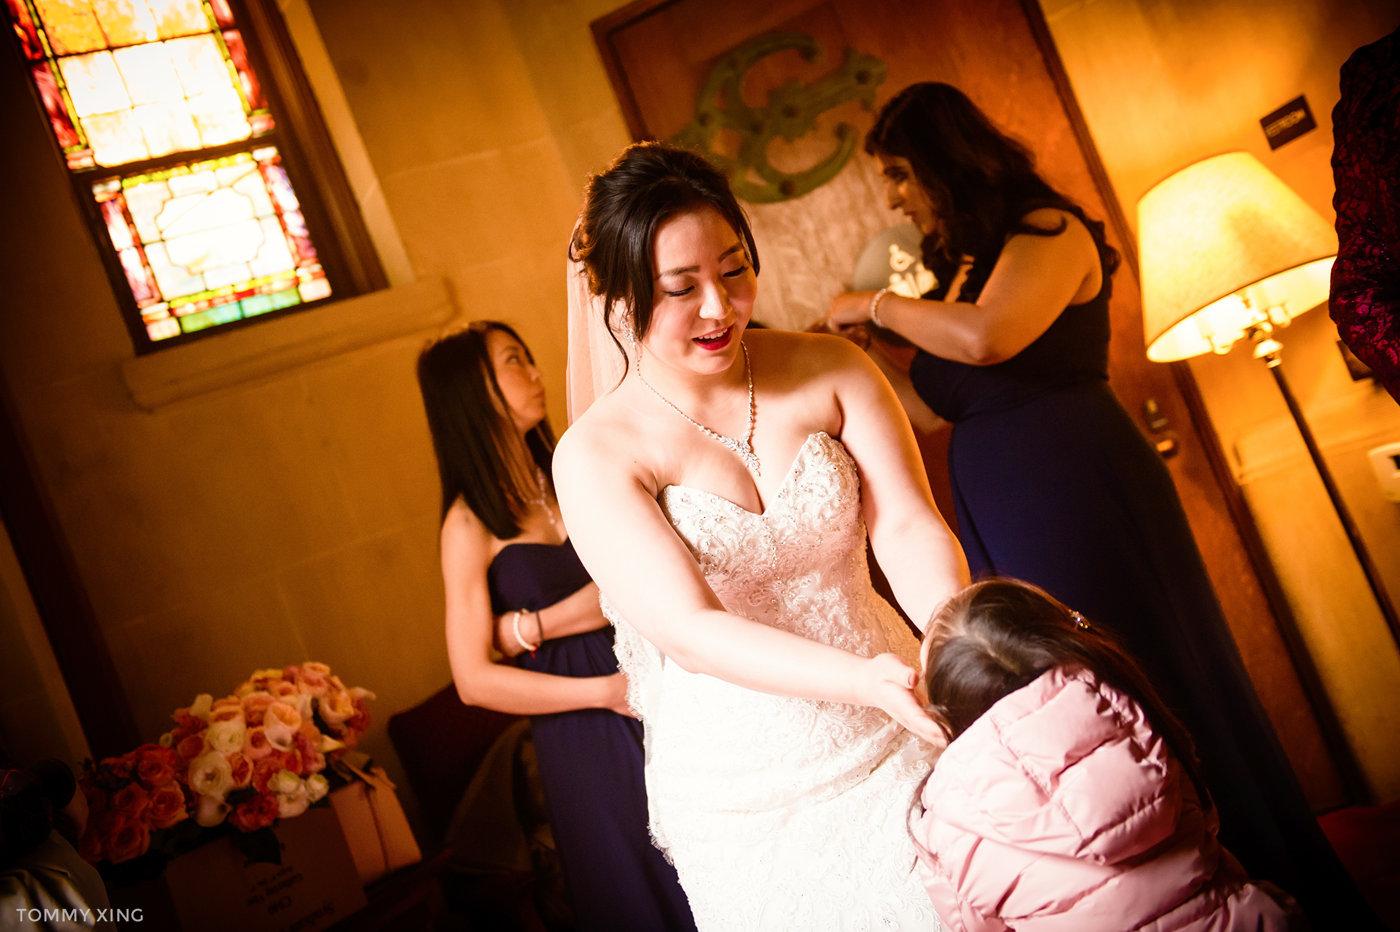 STANFORD MEMORIAL CHURCH WEDDING - Wenjie & Chengcheng - SAN FRANCISCO BAY AREA 斯坦福教堂婚礼跟拍 - 洛杉矶婚礼婚纱照摄影师 Tommy Xing Photography051.jpg